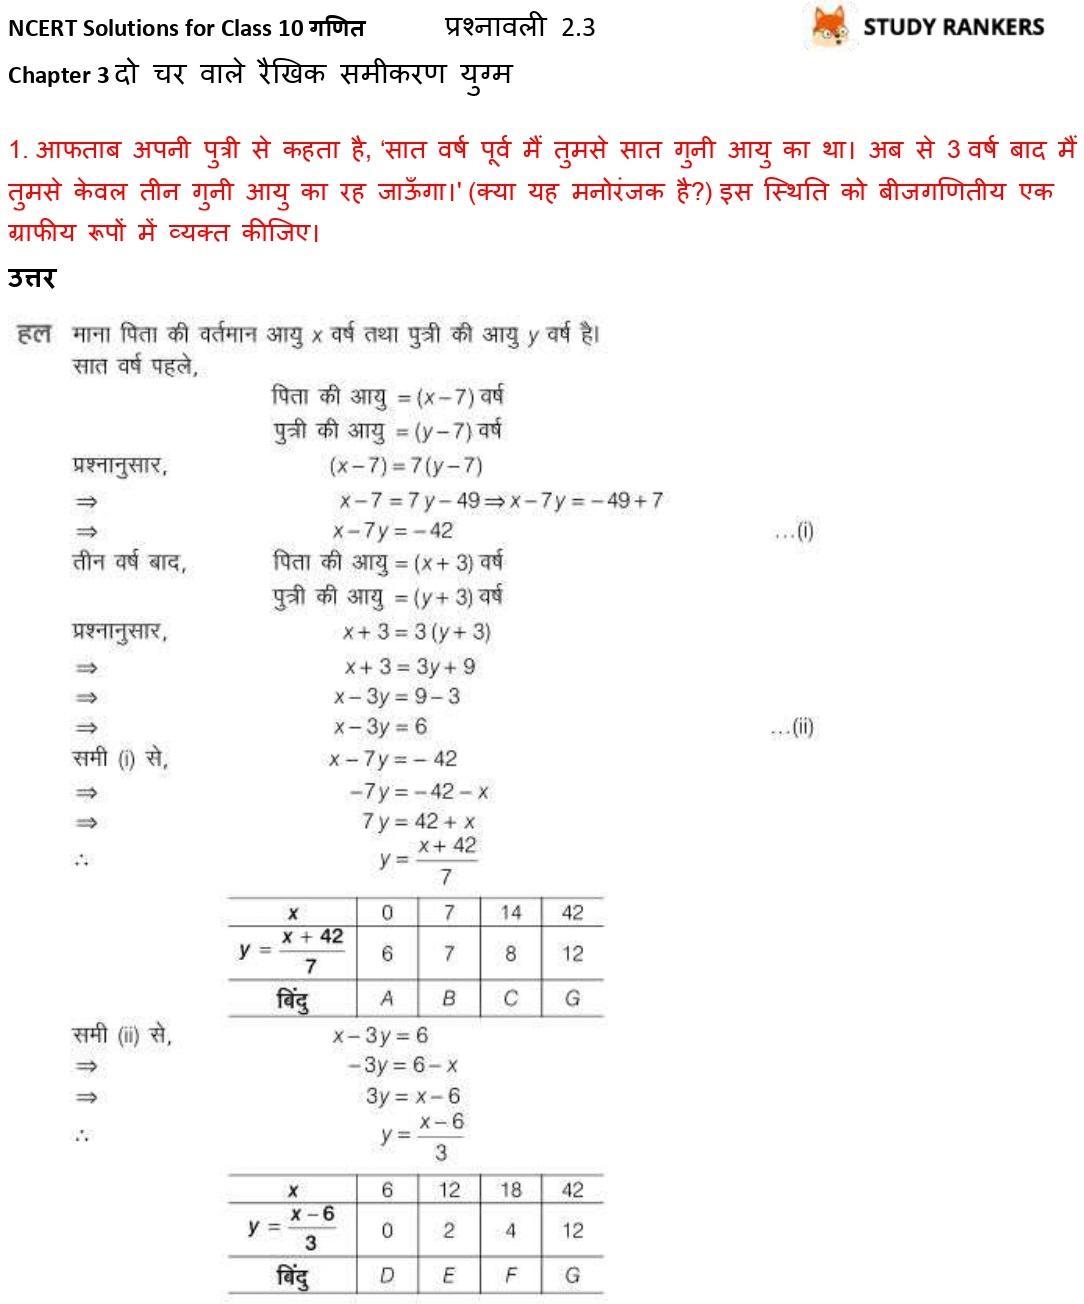 NCERT Solutions for Class 10 Maths Chapter 3 दो चर वाले रैखिक समीकरण युग्म प्रश्नावली 3.1 Part 1